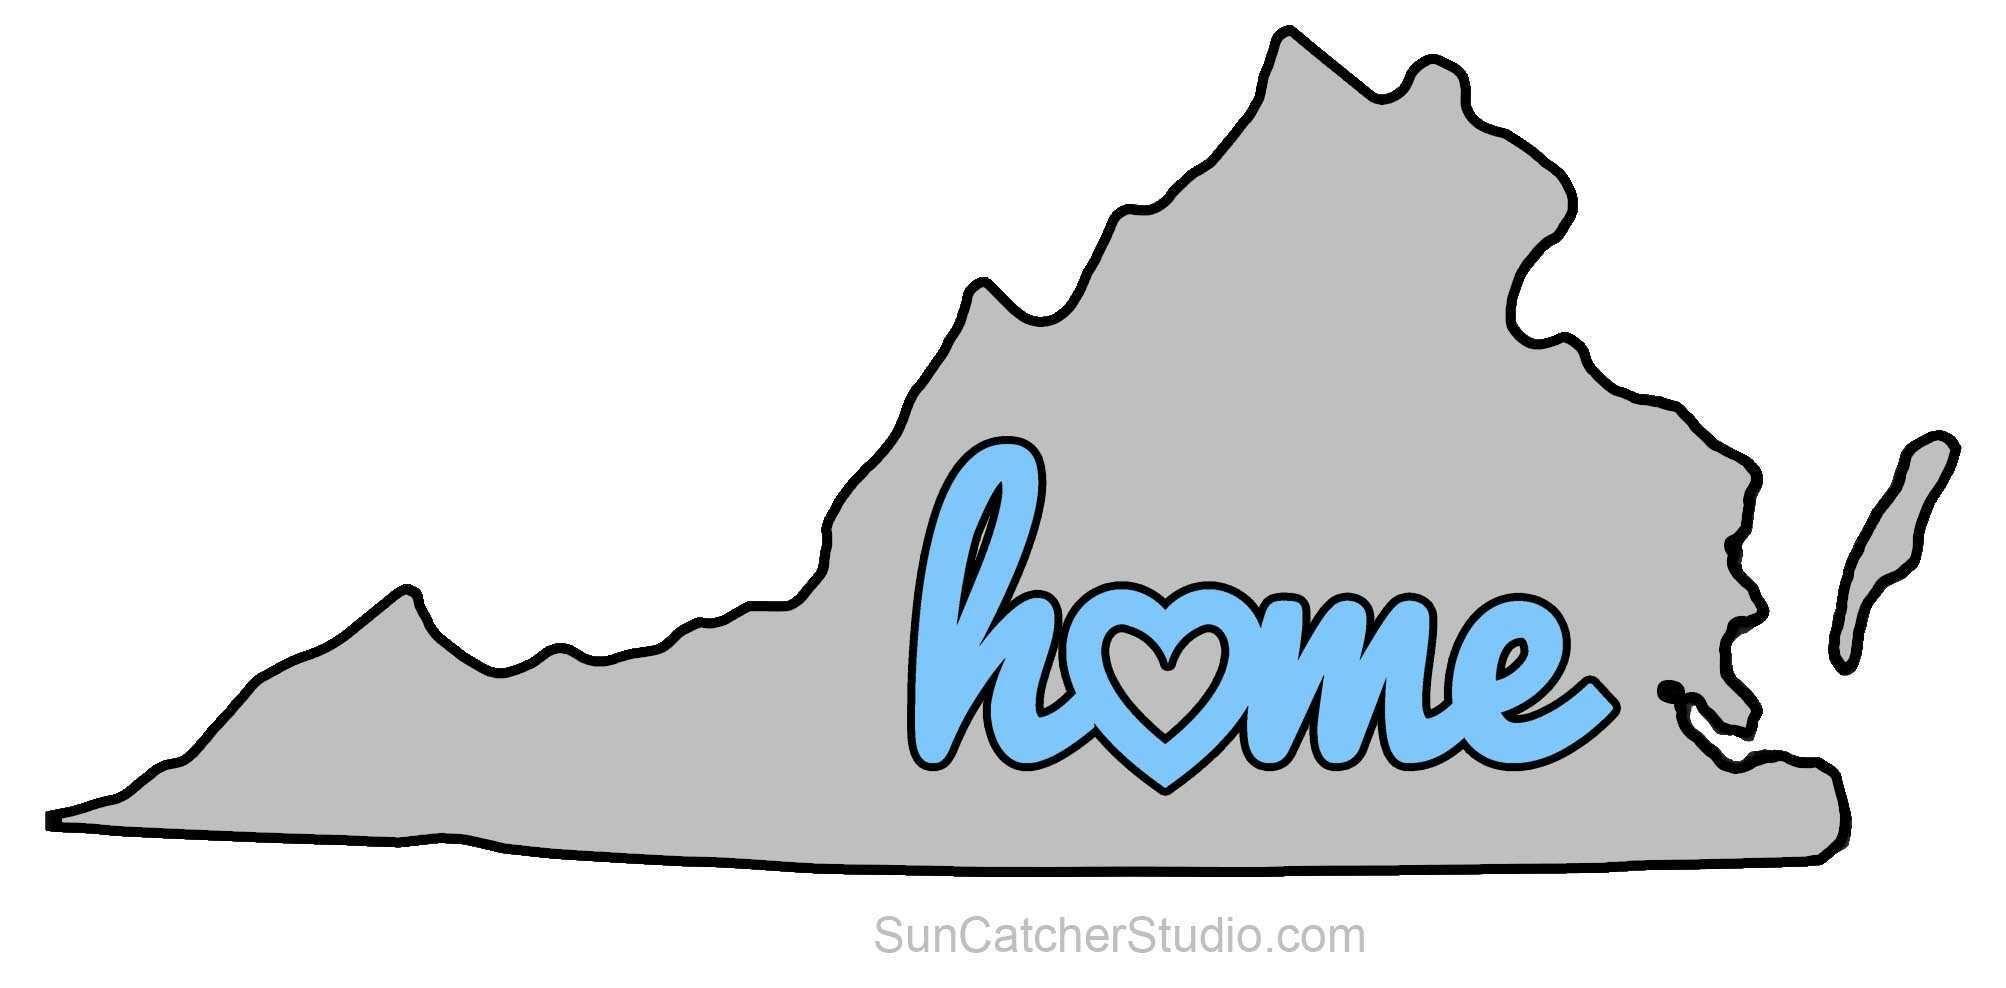 Virginia.